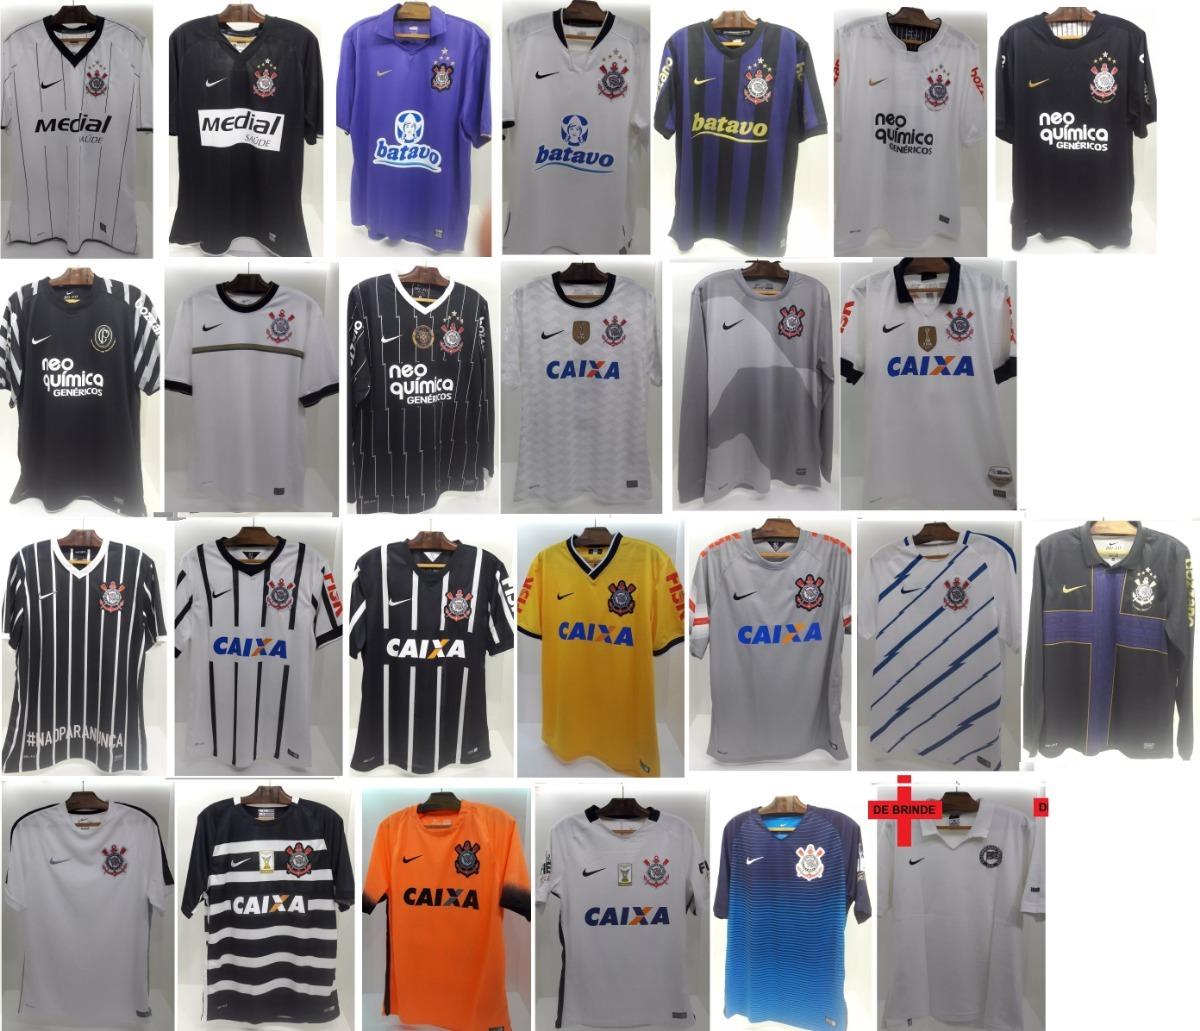 34648899a9 Lote 25 Camisas Nike Corinthians Oficial 2008a16 + 1 Camisa - R ...